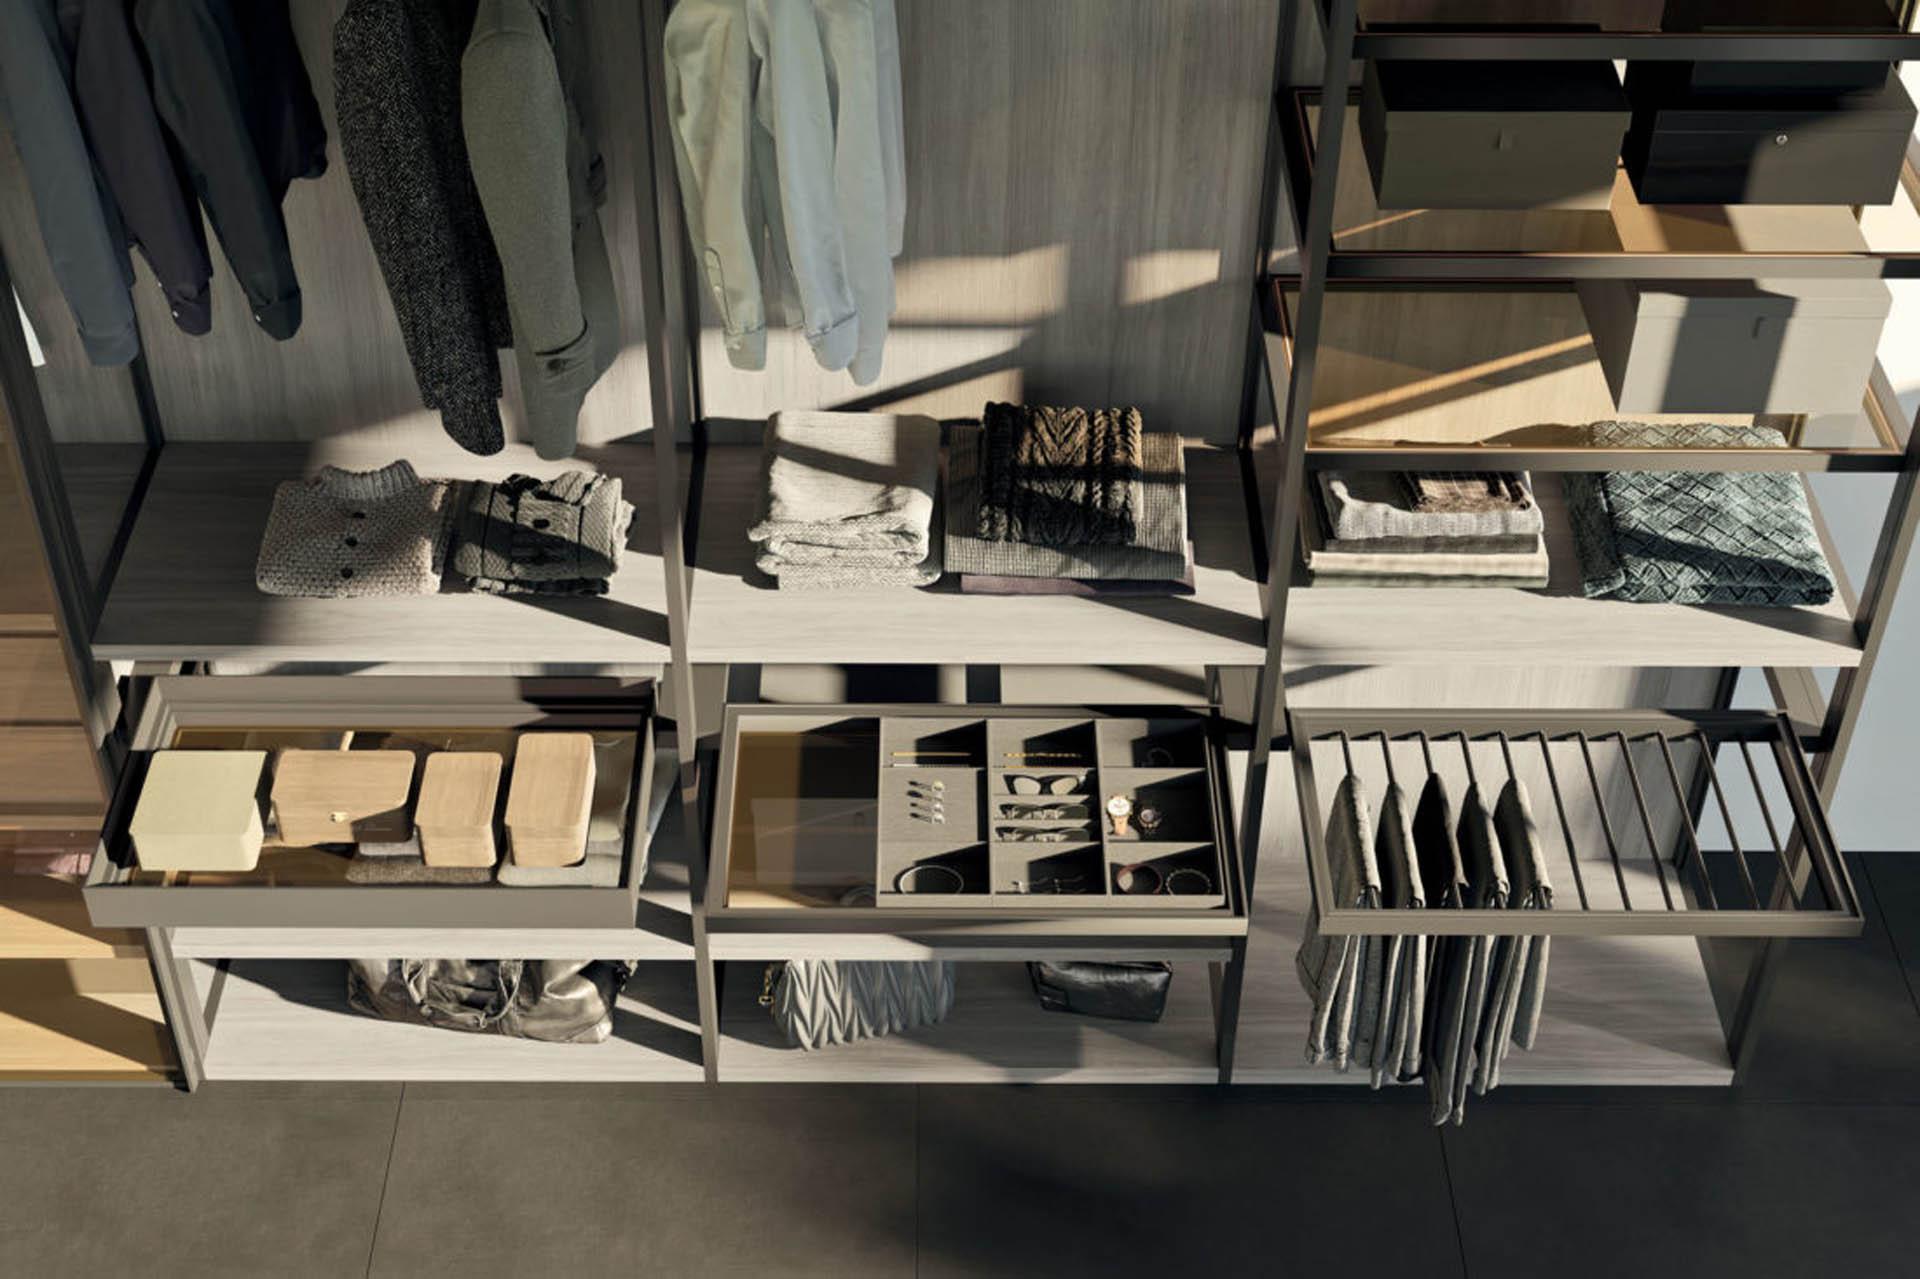 cabina-armadio-skeletro-9-orme-1100x733